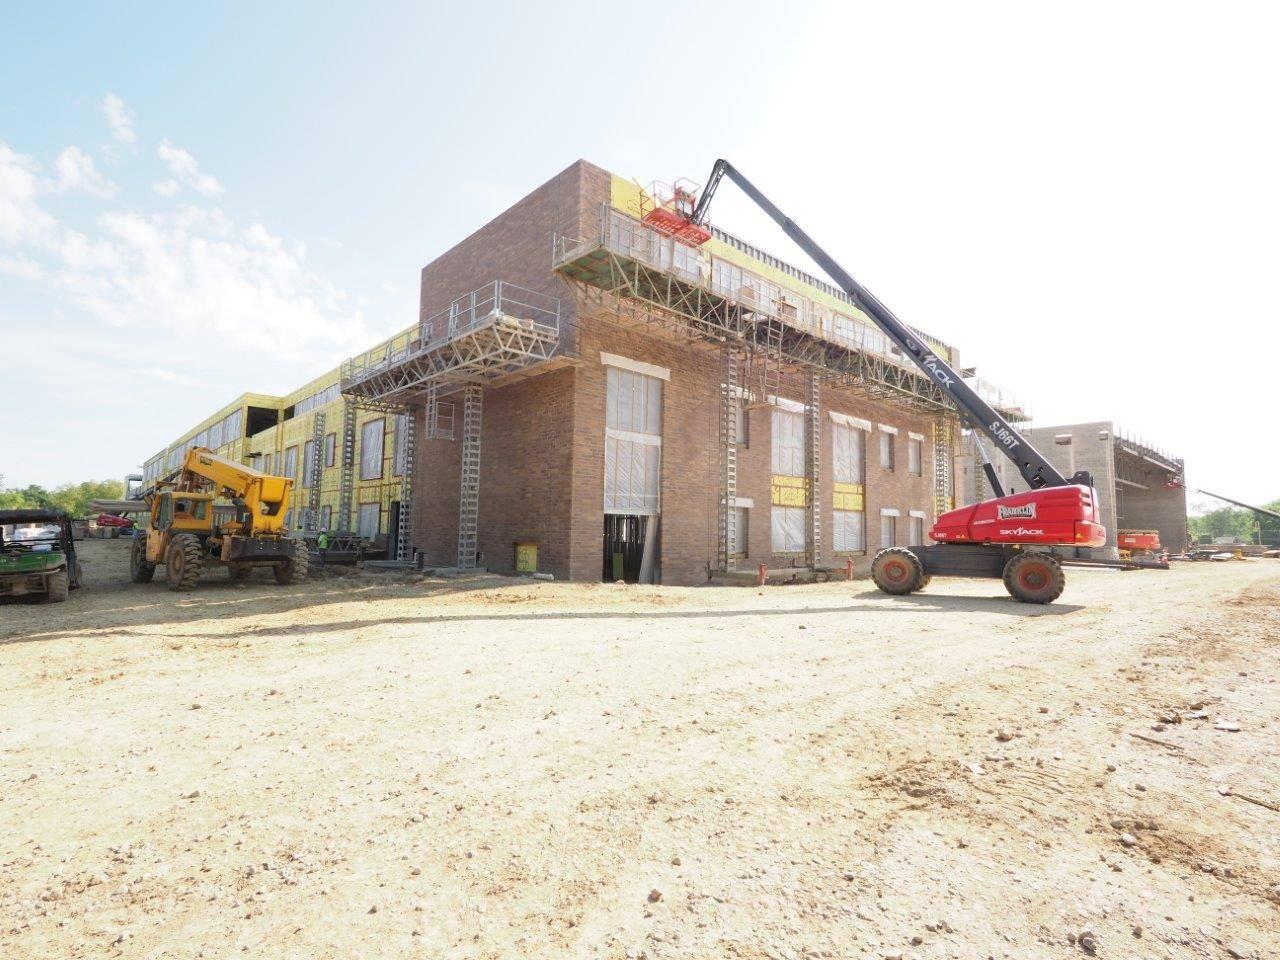 Masonry work on the new Upper Arlington High School